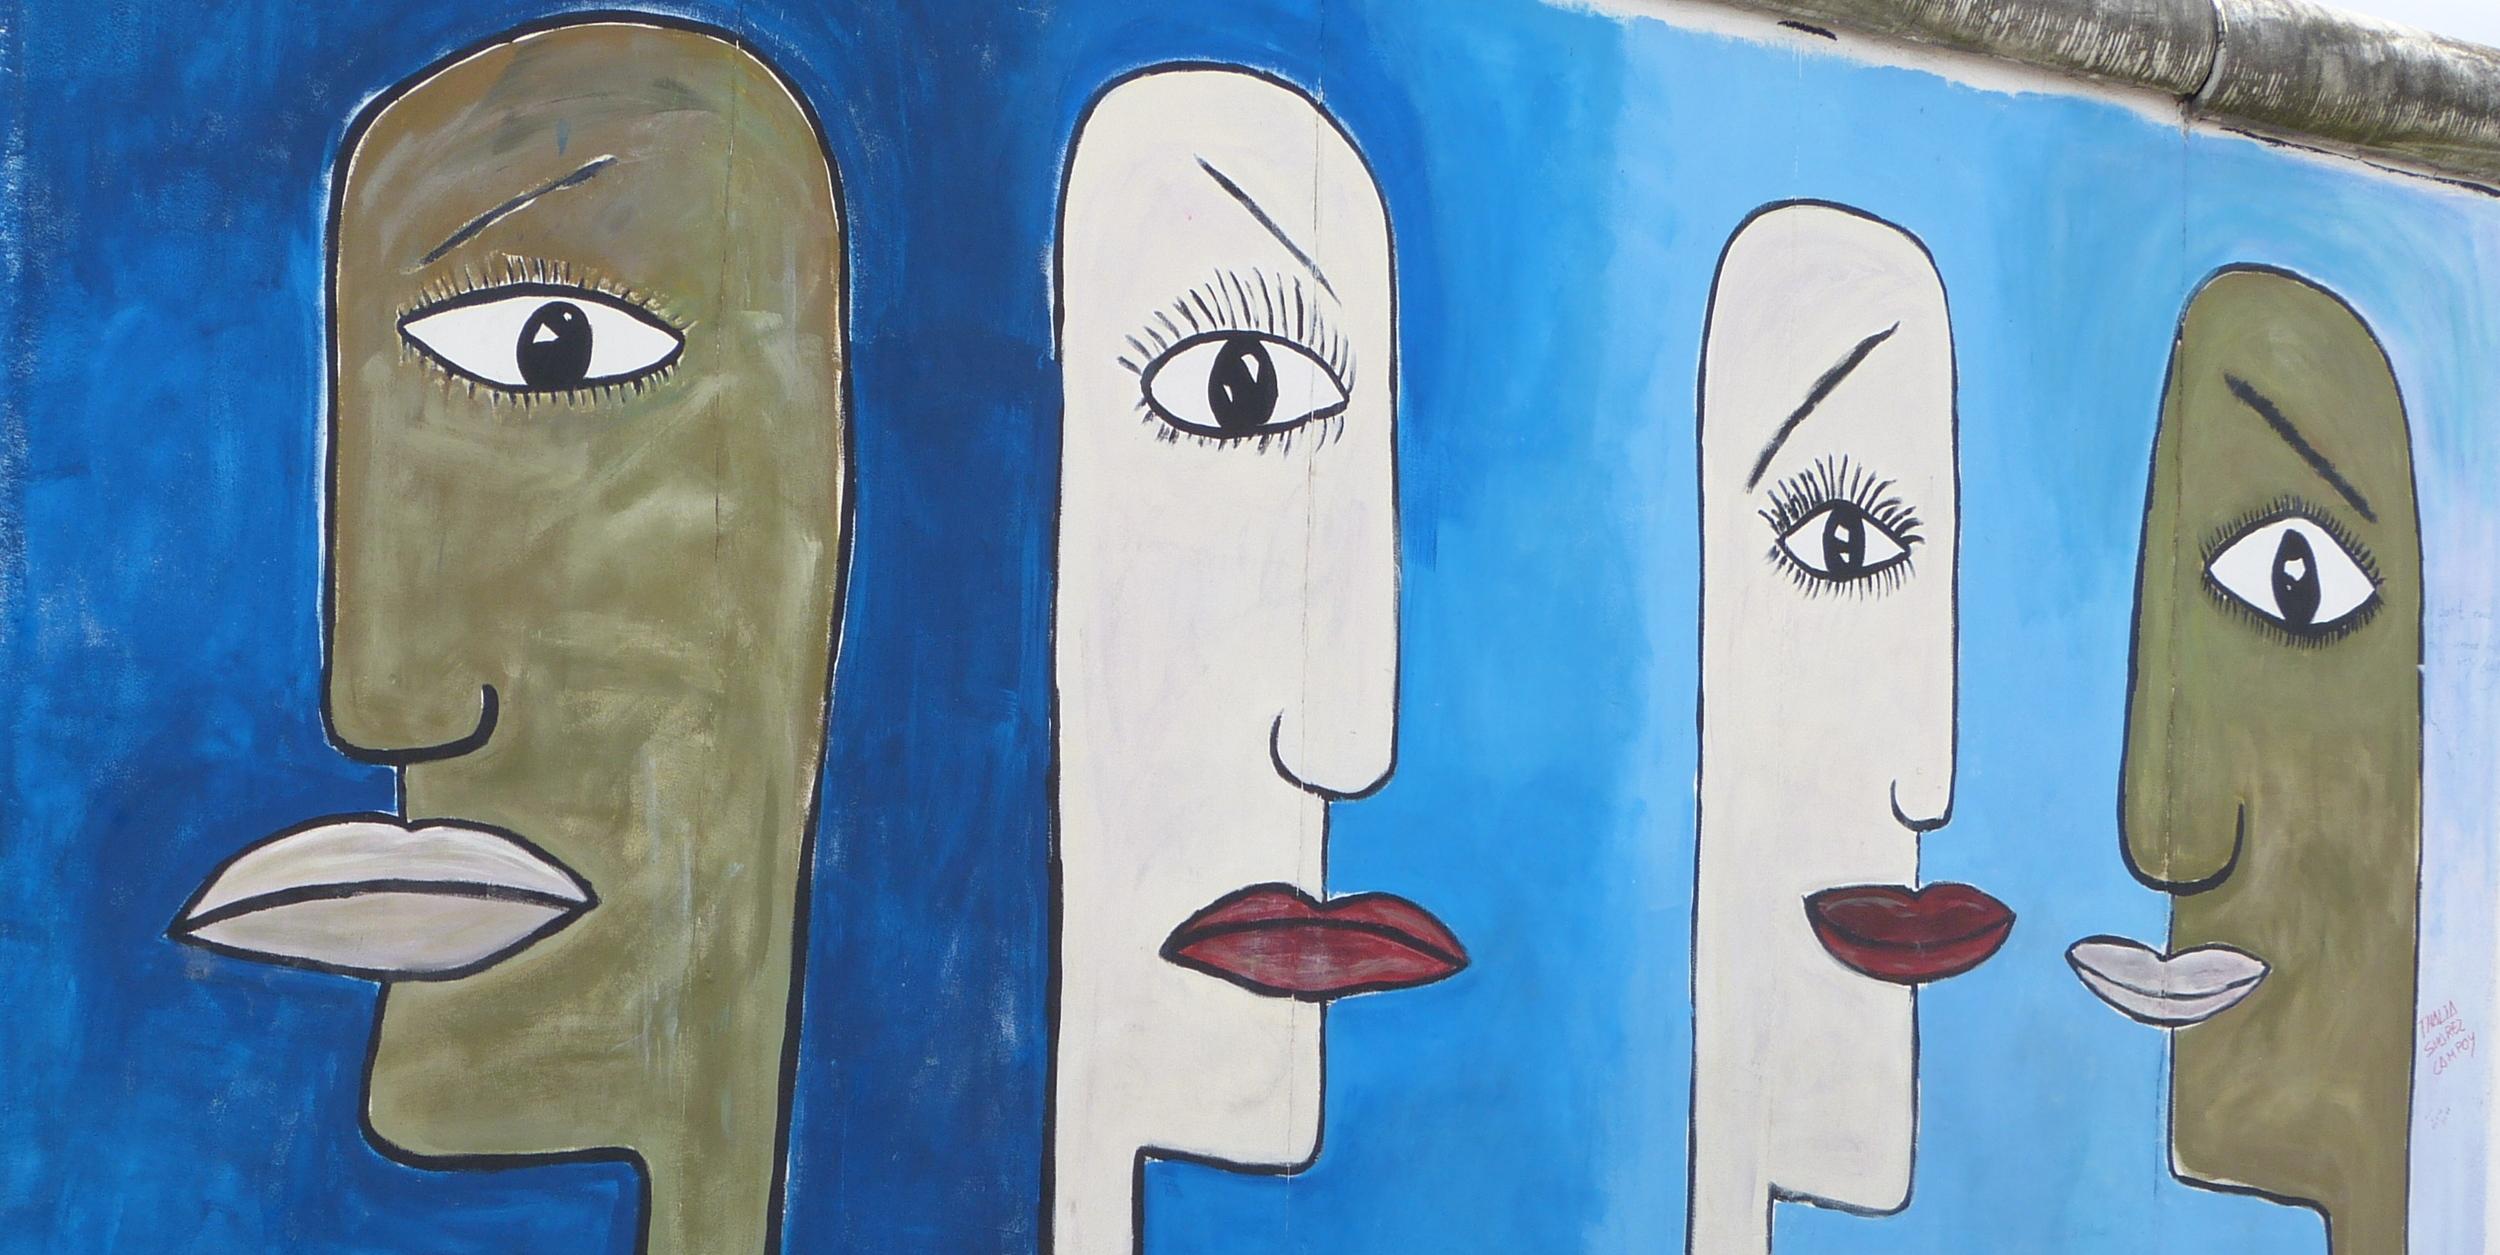 120408-Berlin-East-Side-Gallery_Tolerance1.jpg